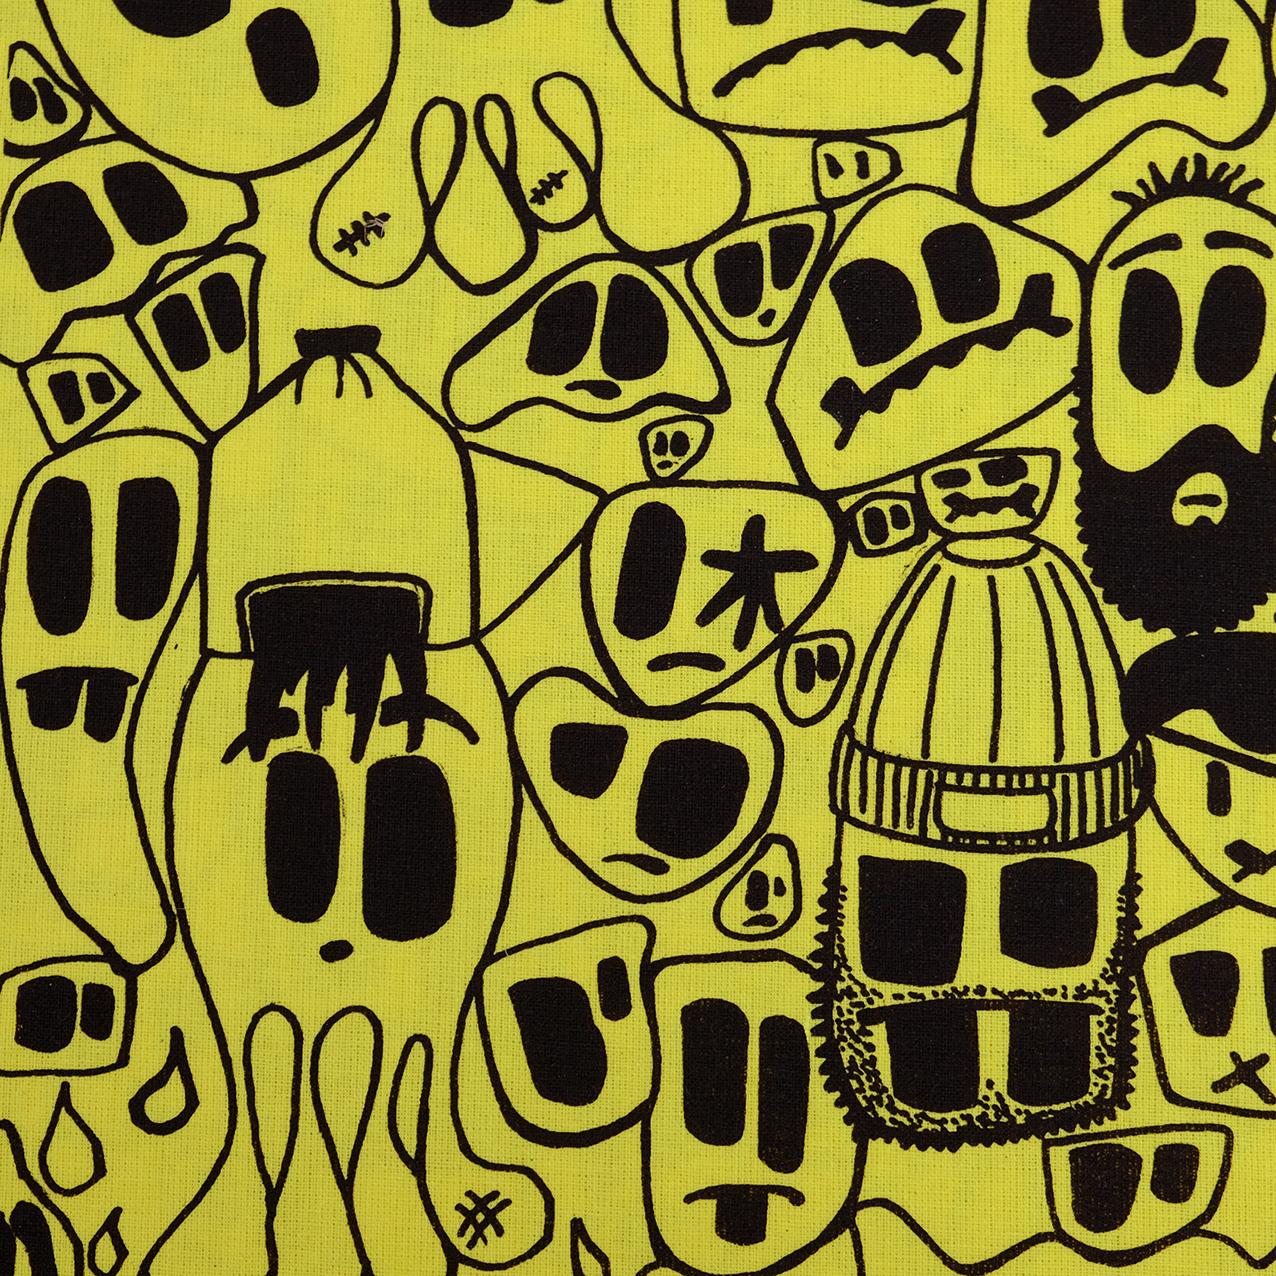 'Monster Fam' Tote by Andrew Kiwanuka